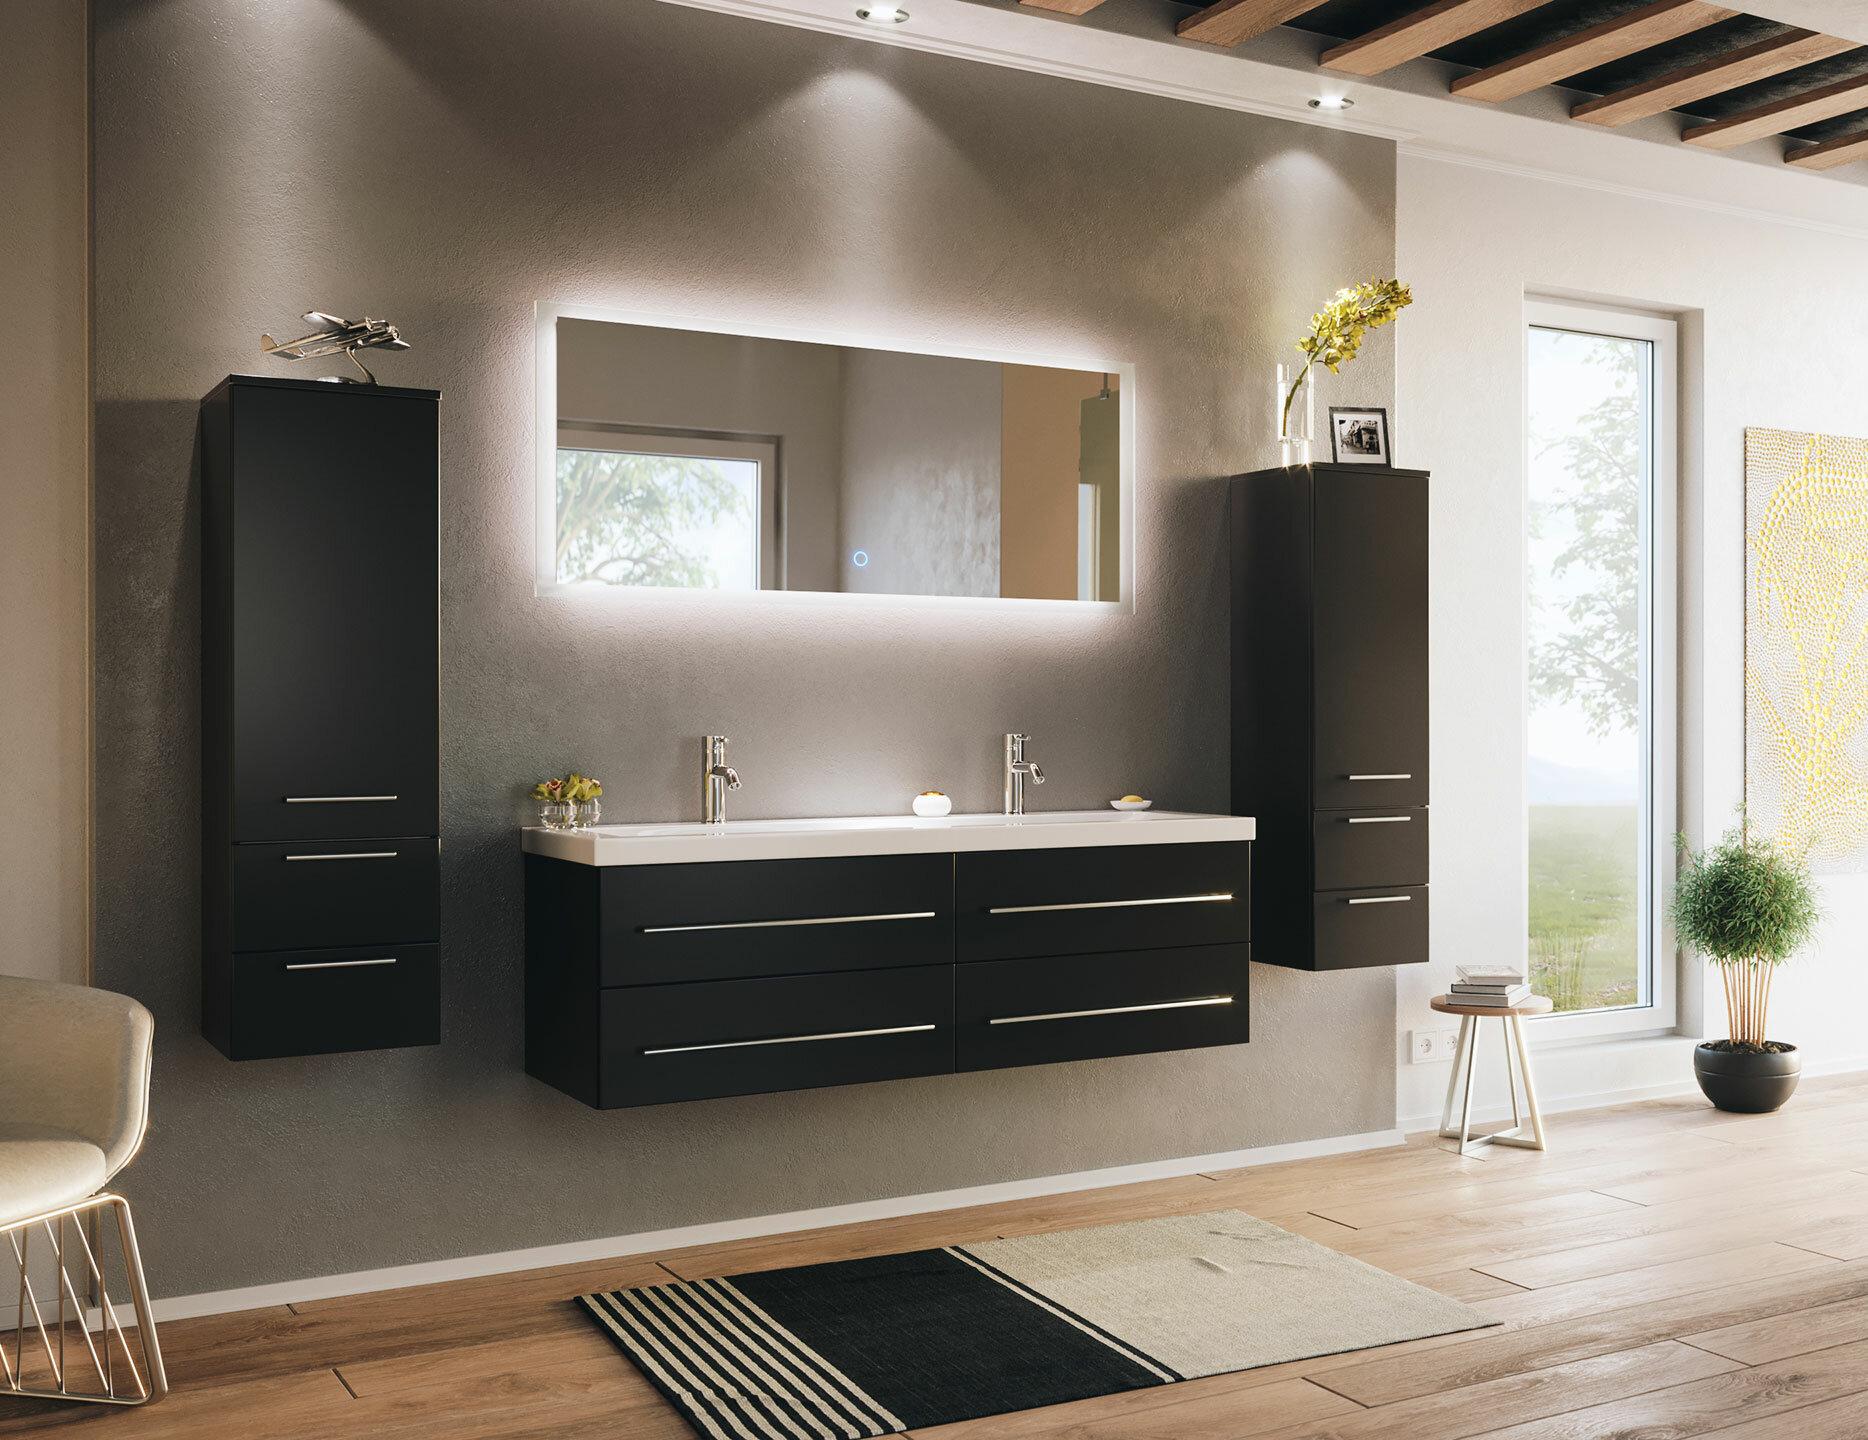 Top Image Wayfair Bathroom Suites